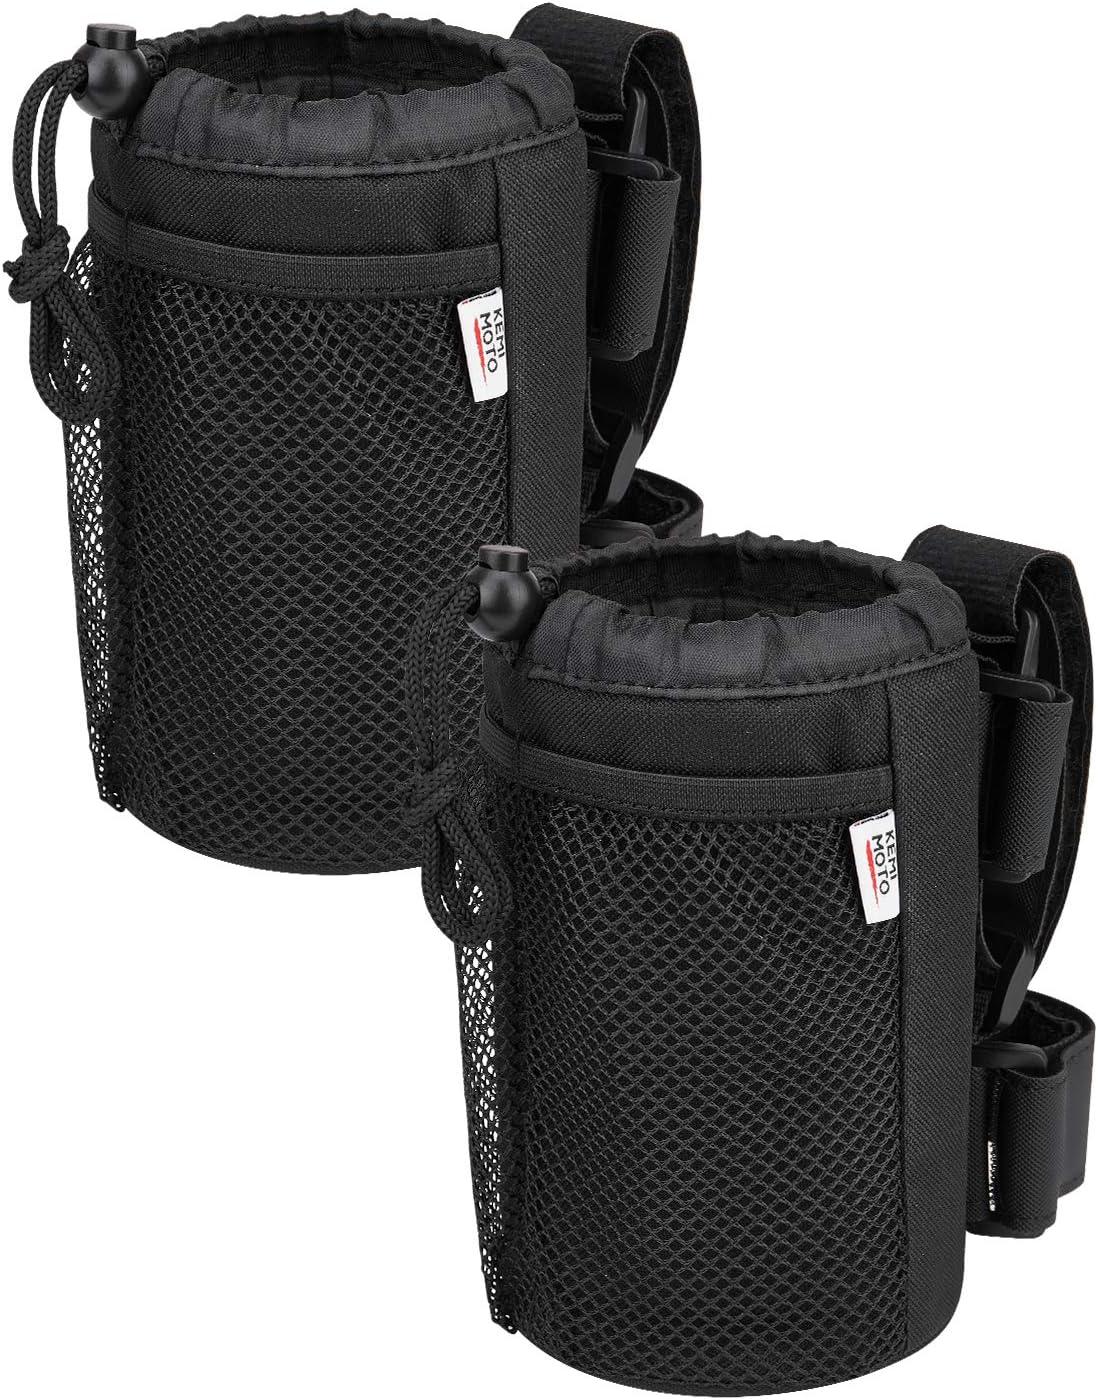 (2 Pack) kemimoto Wheelchair Cup Holder, Rollator Drink Holder Universal Walker Stroller Water Bottle Carrier with Mesh Pockets-Washable Collapsible Adjustable, Black